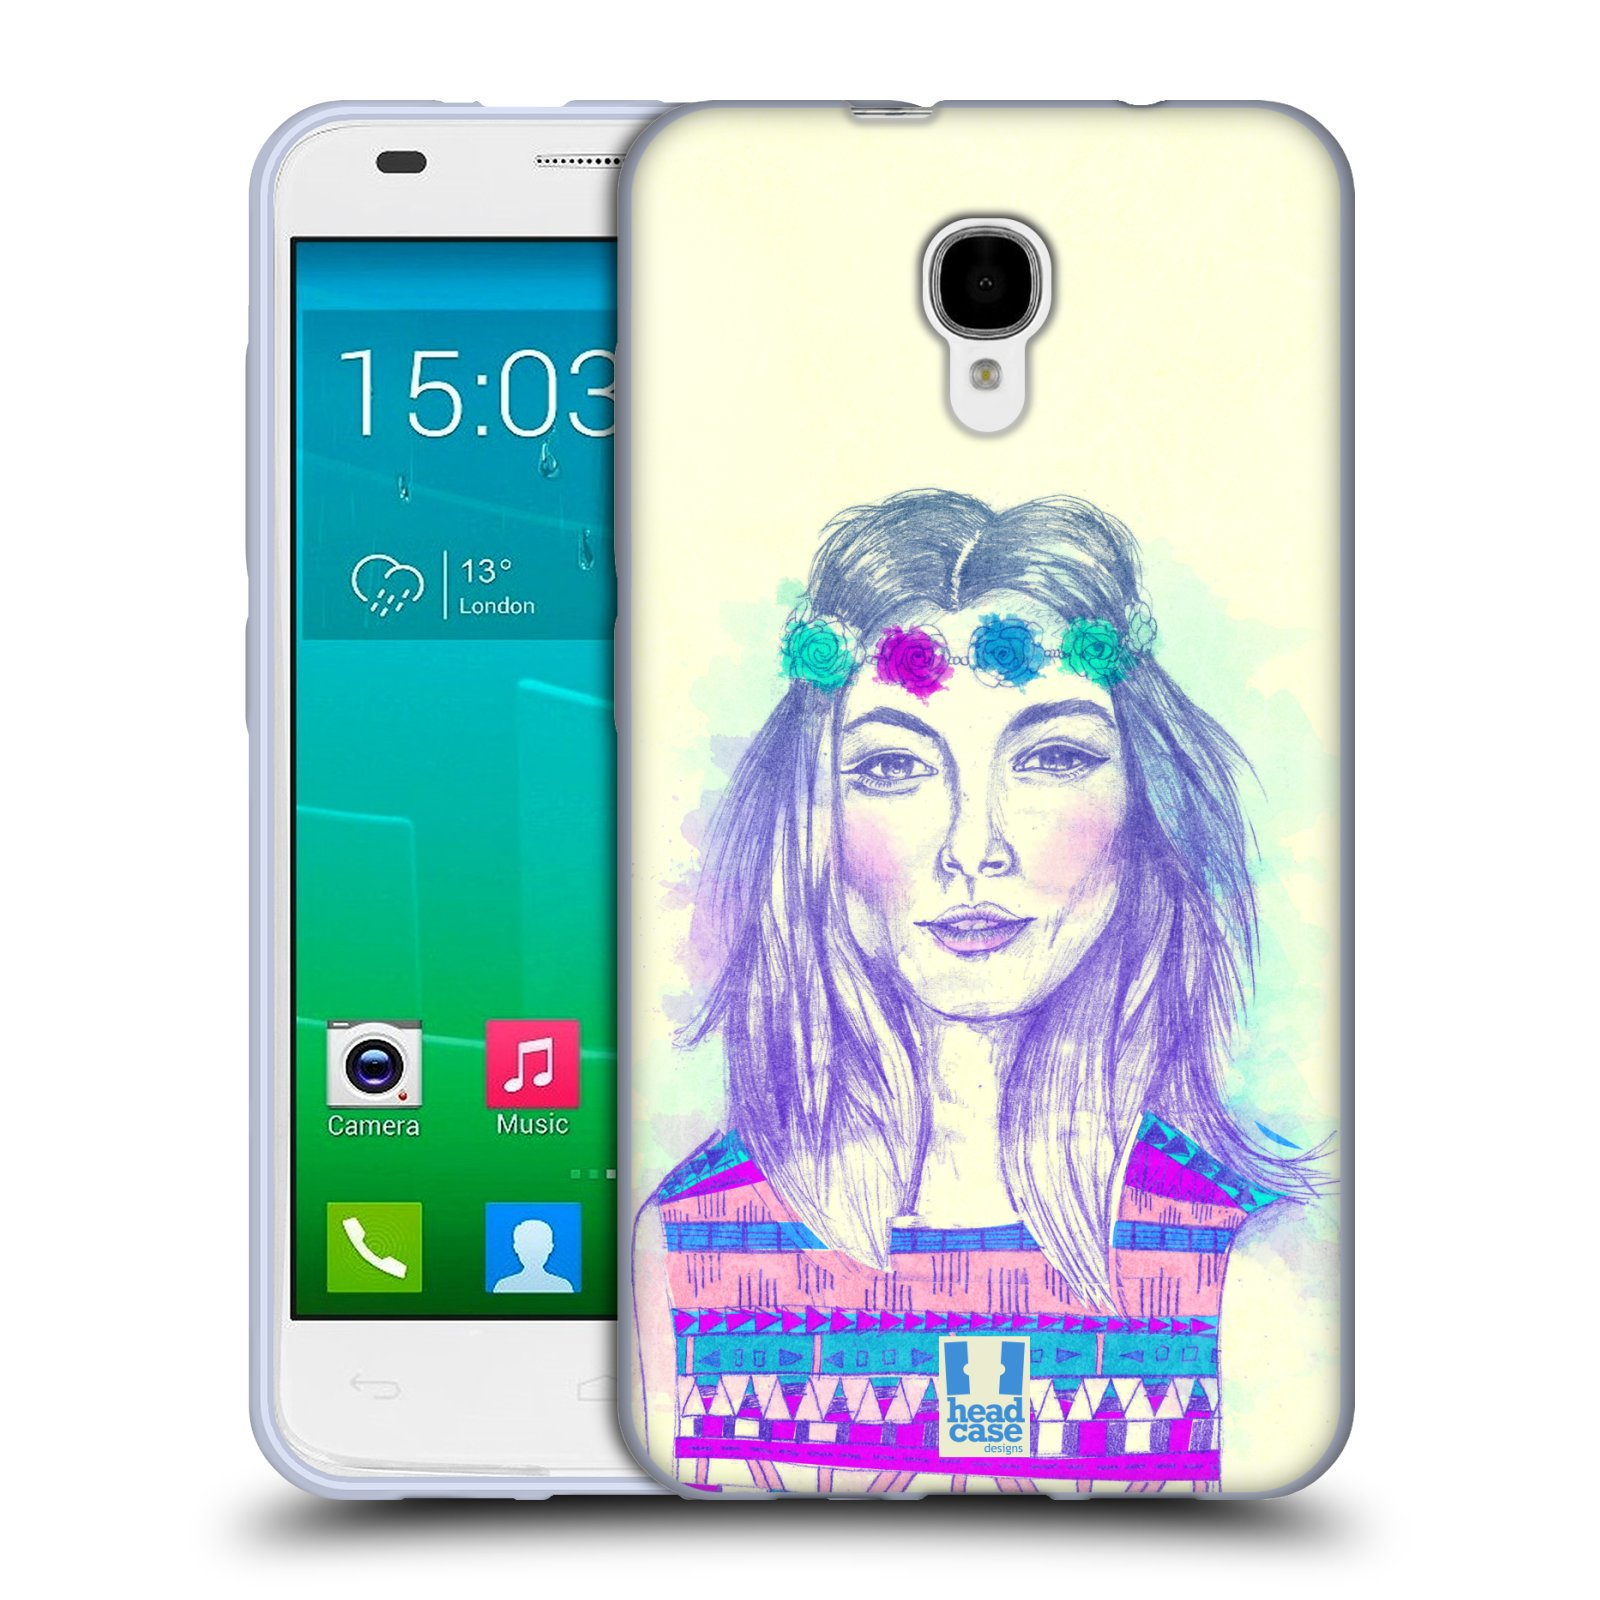 HEAD CASE silikonový obal na mobil Alcatel Idol 2 S OT-6050 vzor Dívka dlouhé květinové vlasy HIPPIE modrá